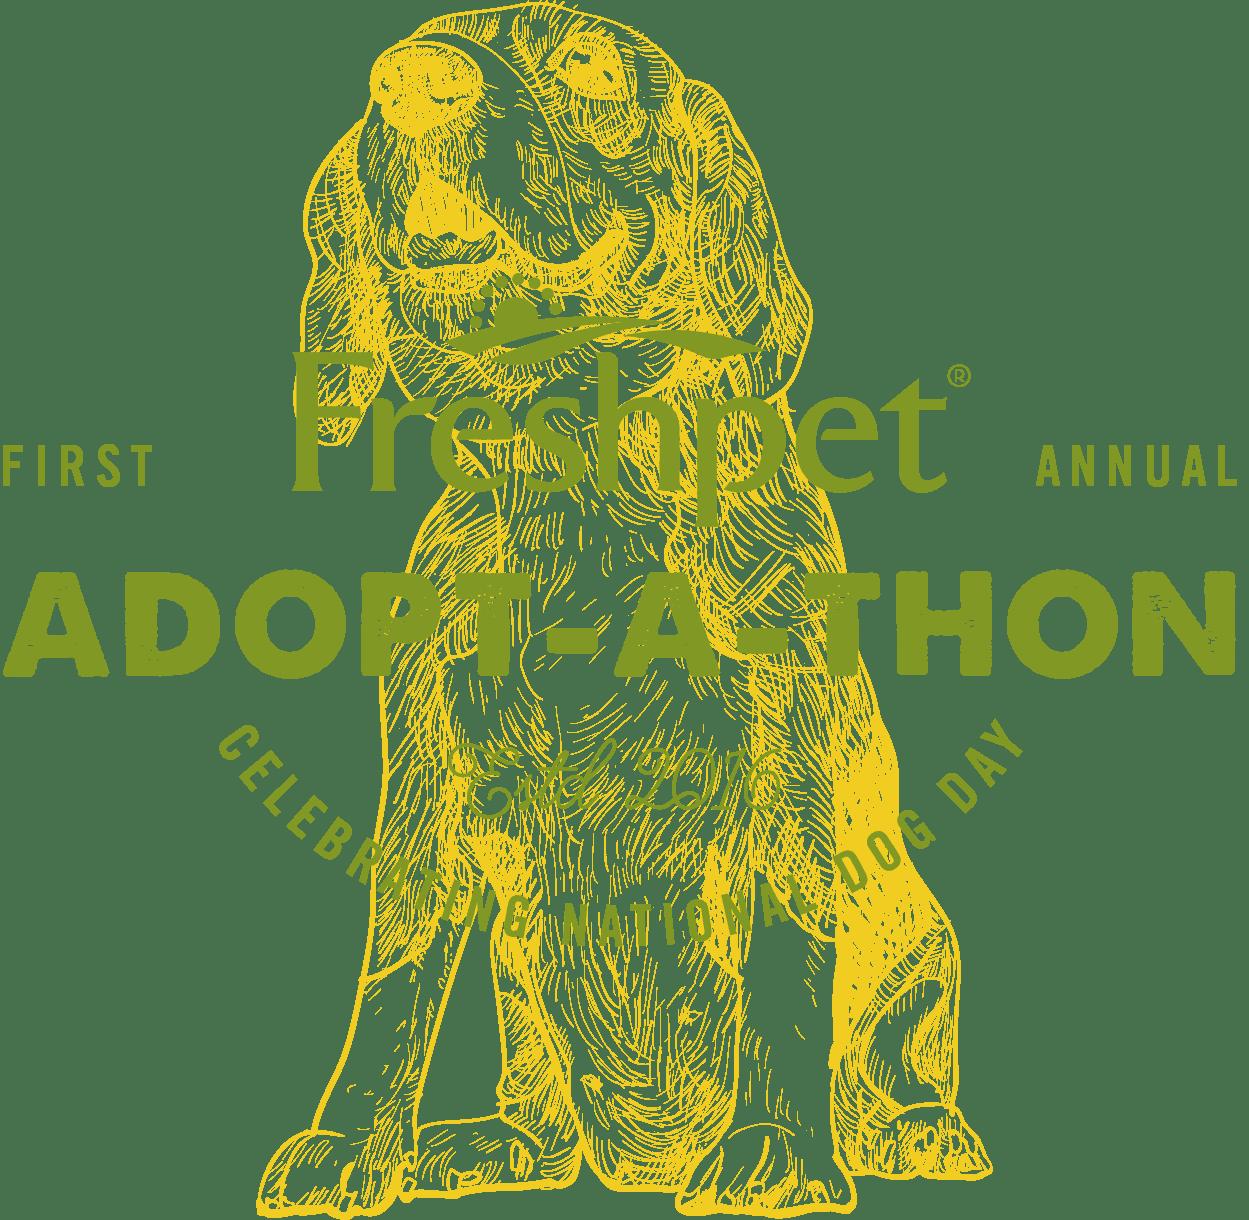 FP_NDD_Adoptathon_logo